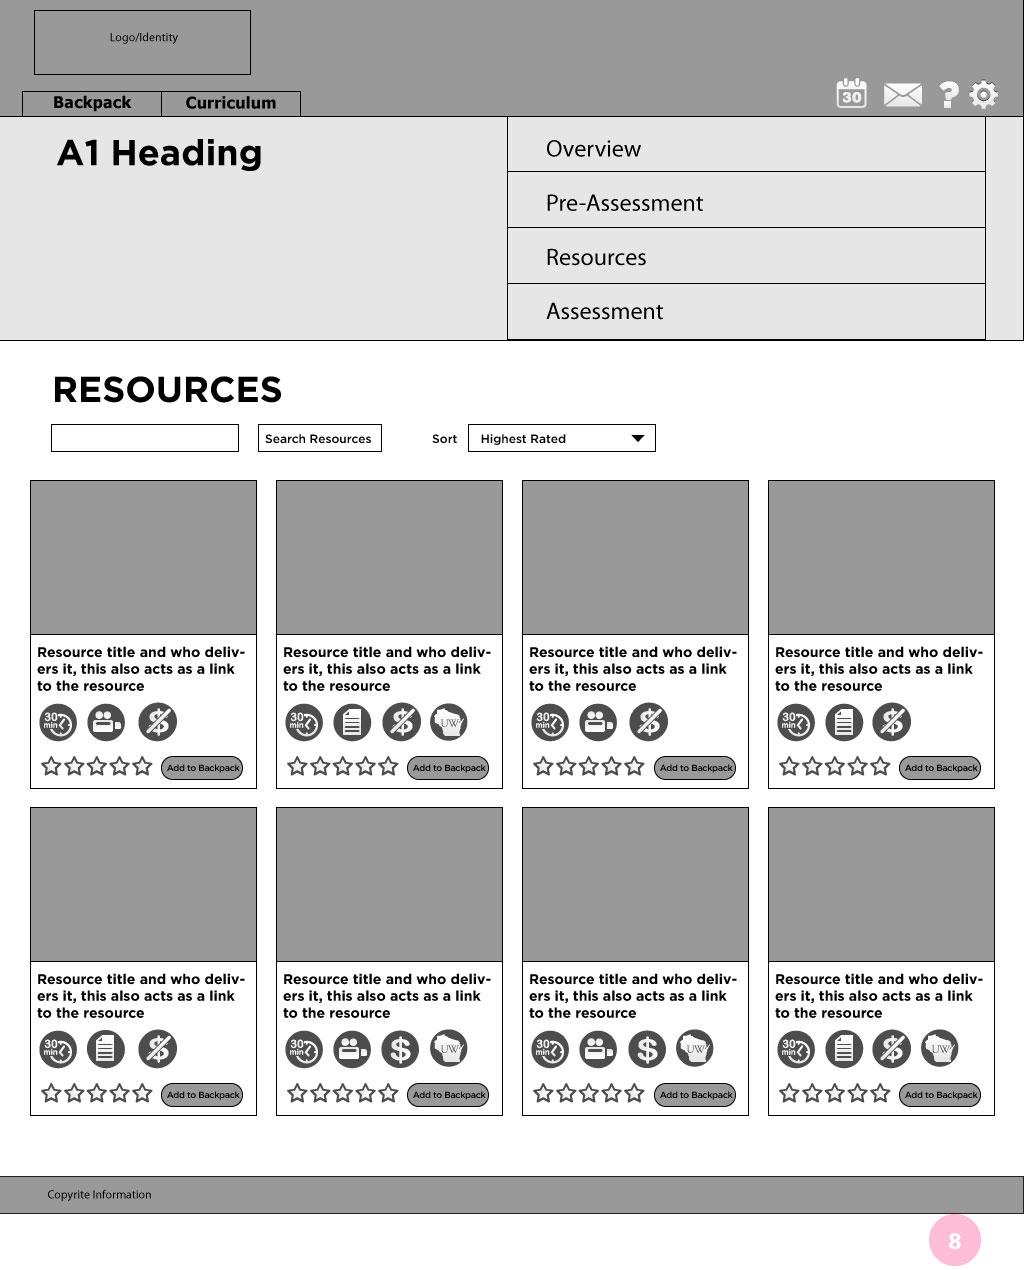 8_Wireframes_Resources